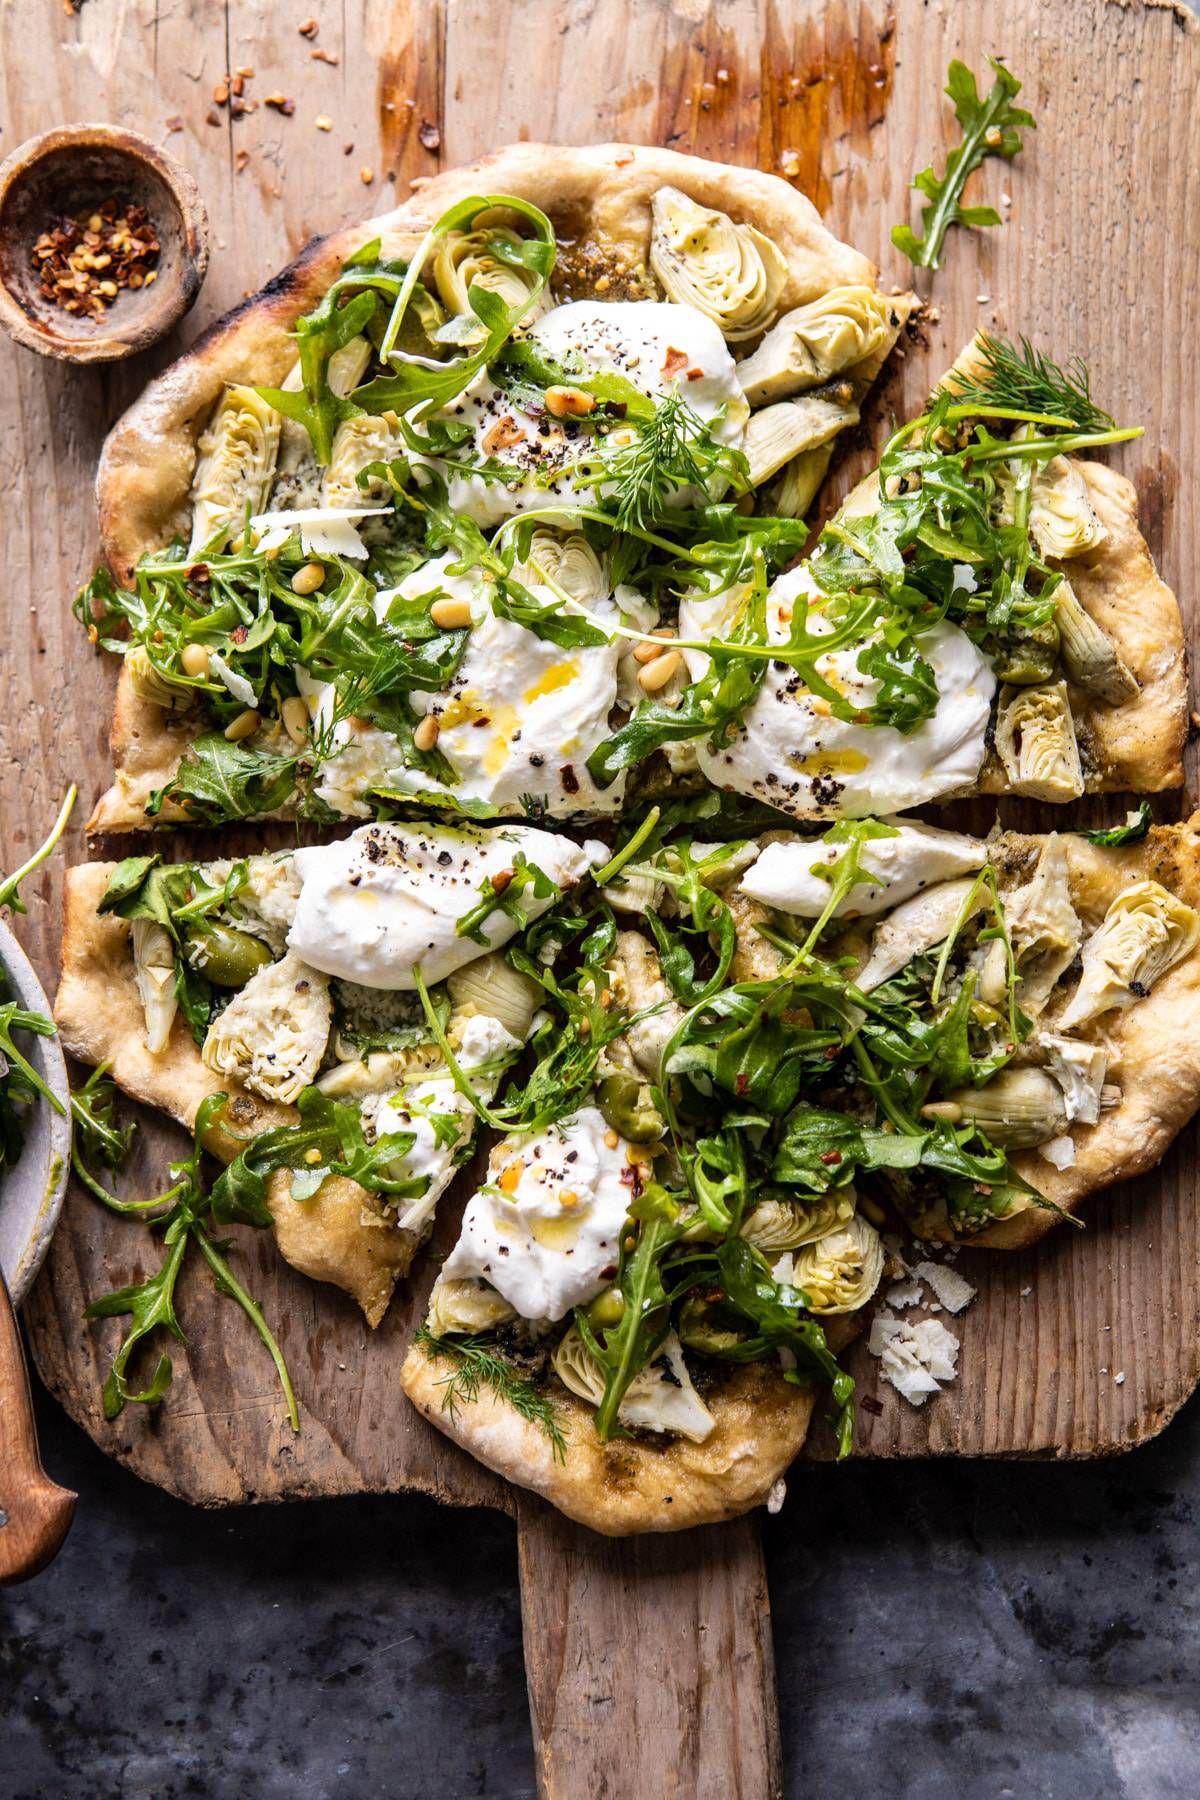 Artichoke Pesto and Burrata Pizza with Lemony Arugula | halfbakedharvest.com #pizza #healthy #burrata #easyrecipes